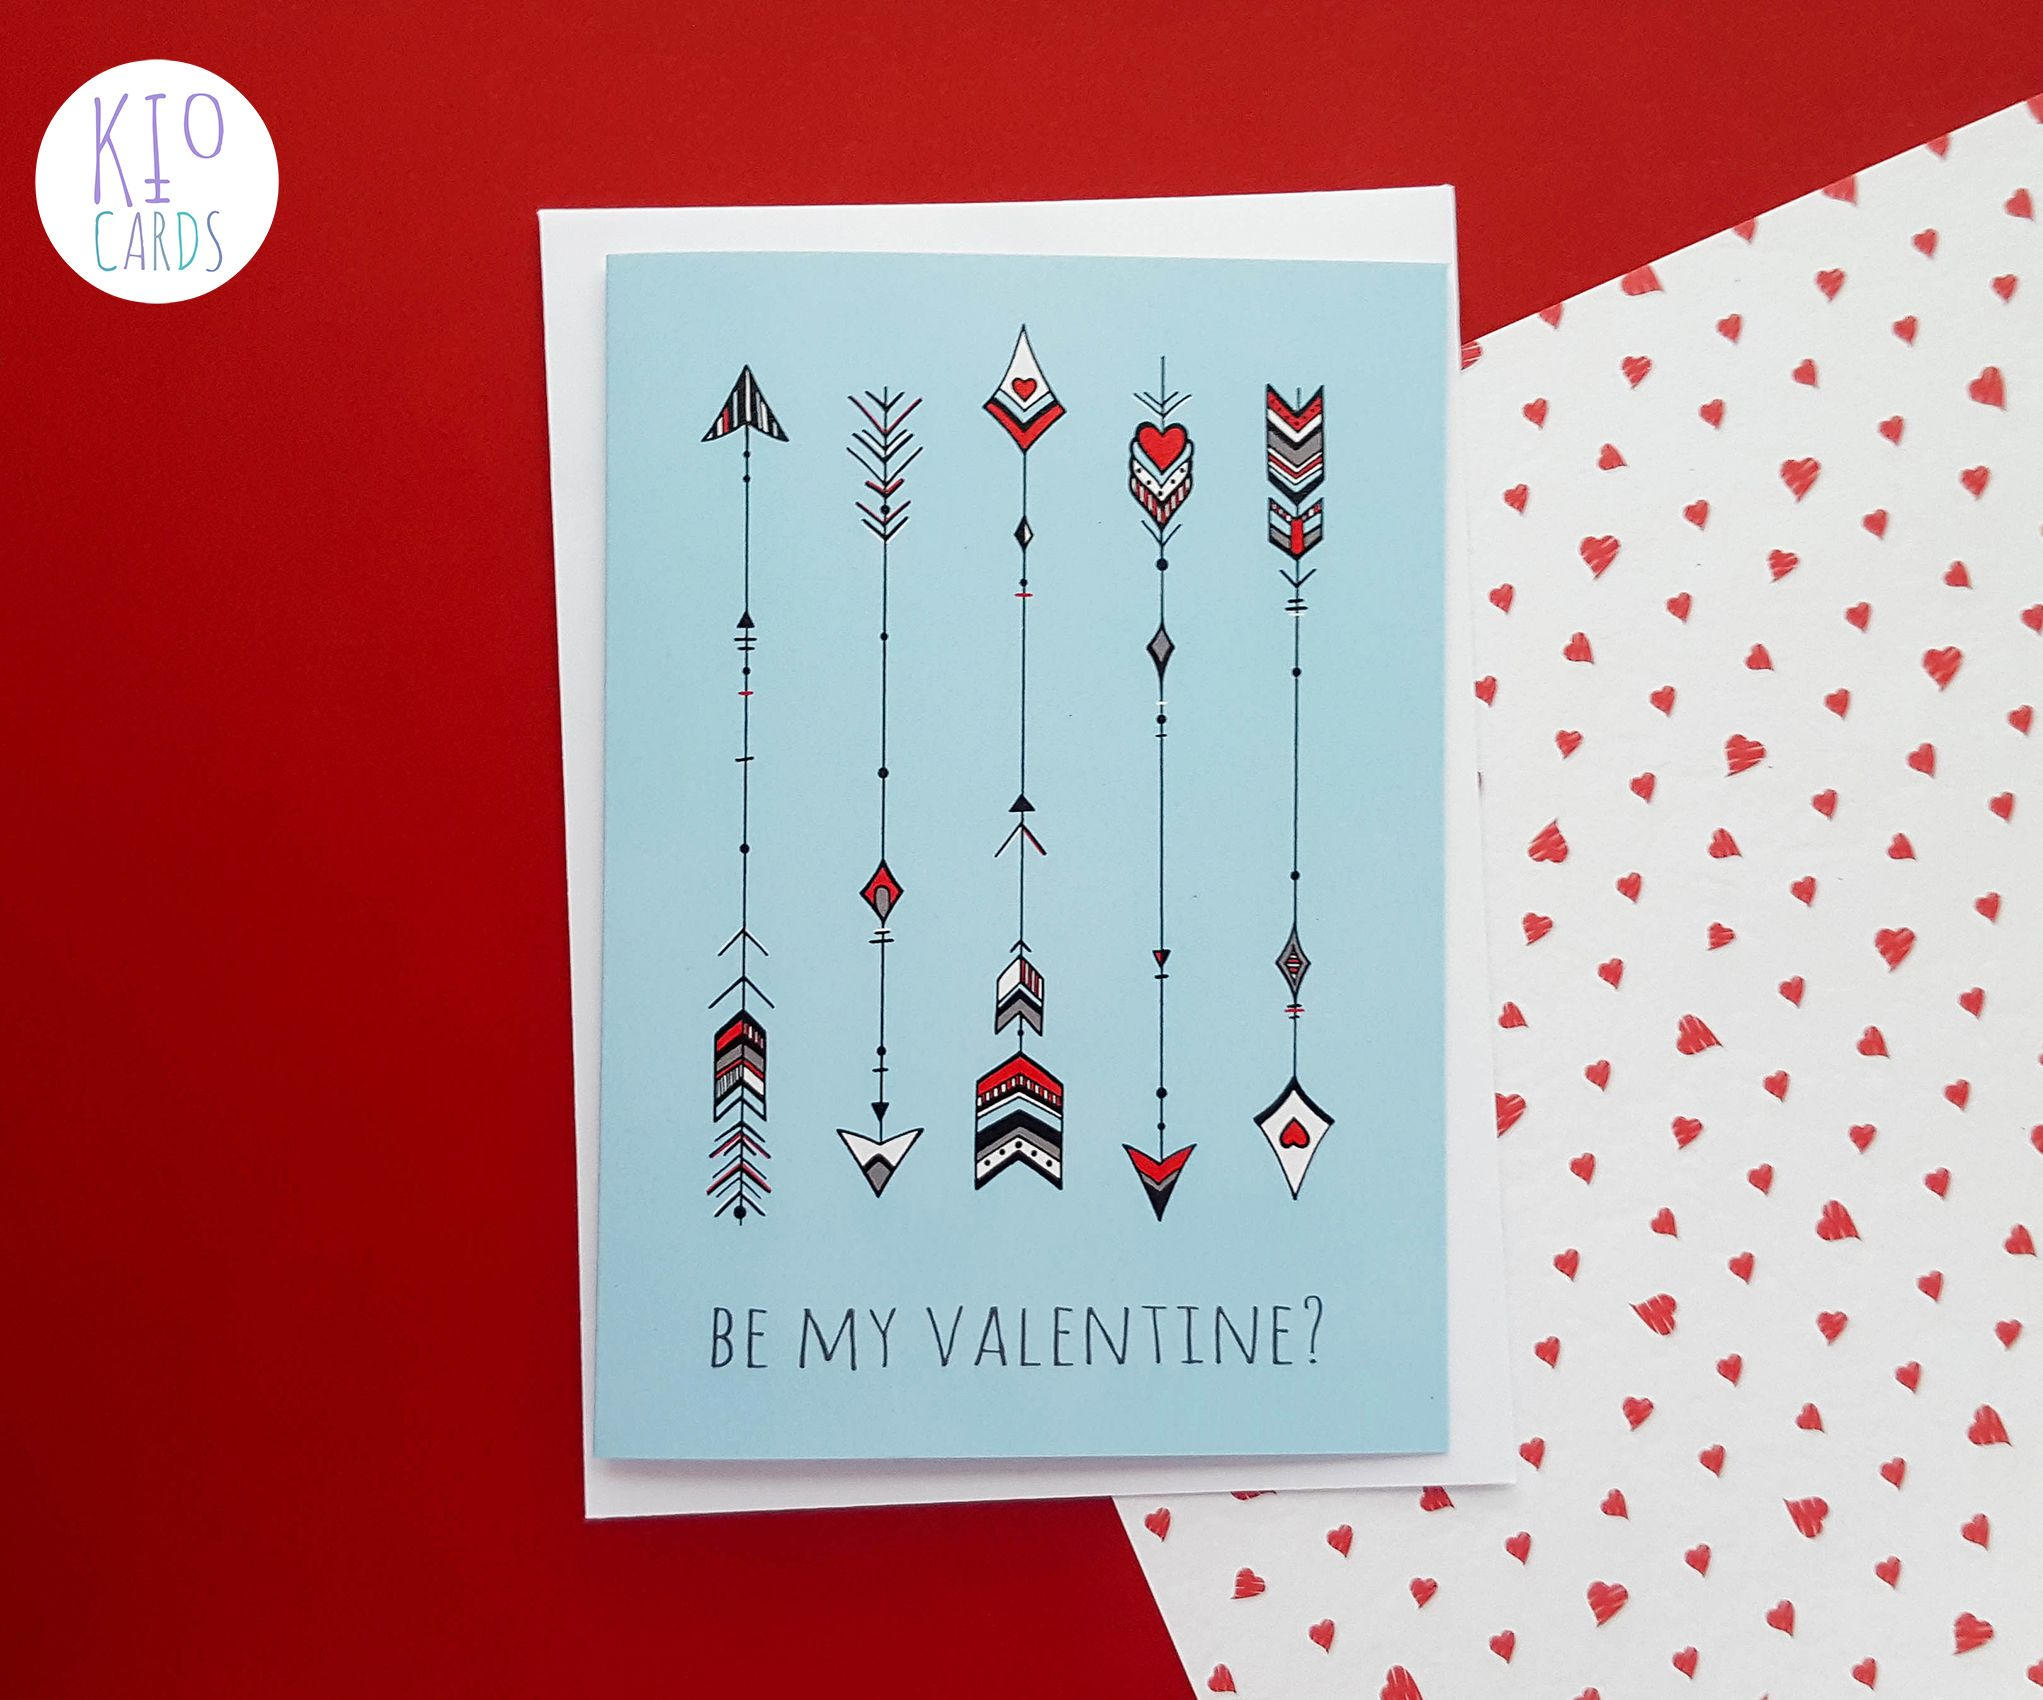 Lovestruck Handmade Valentines Card  KIO Cards romantic love